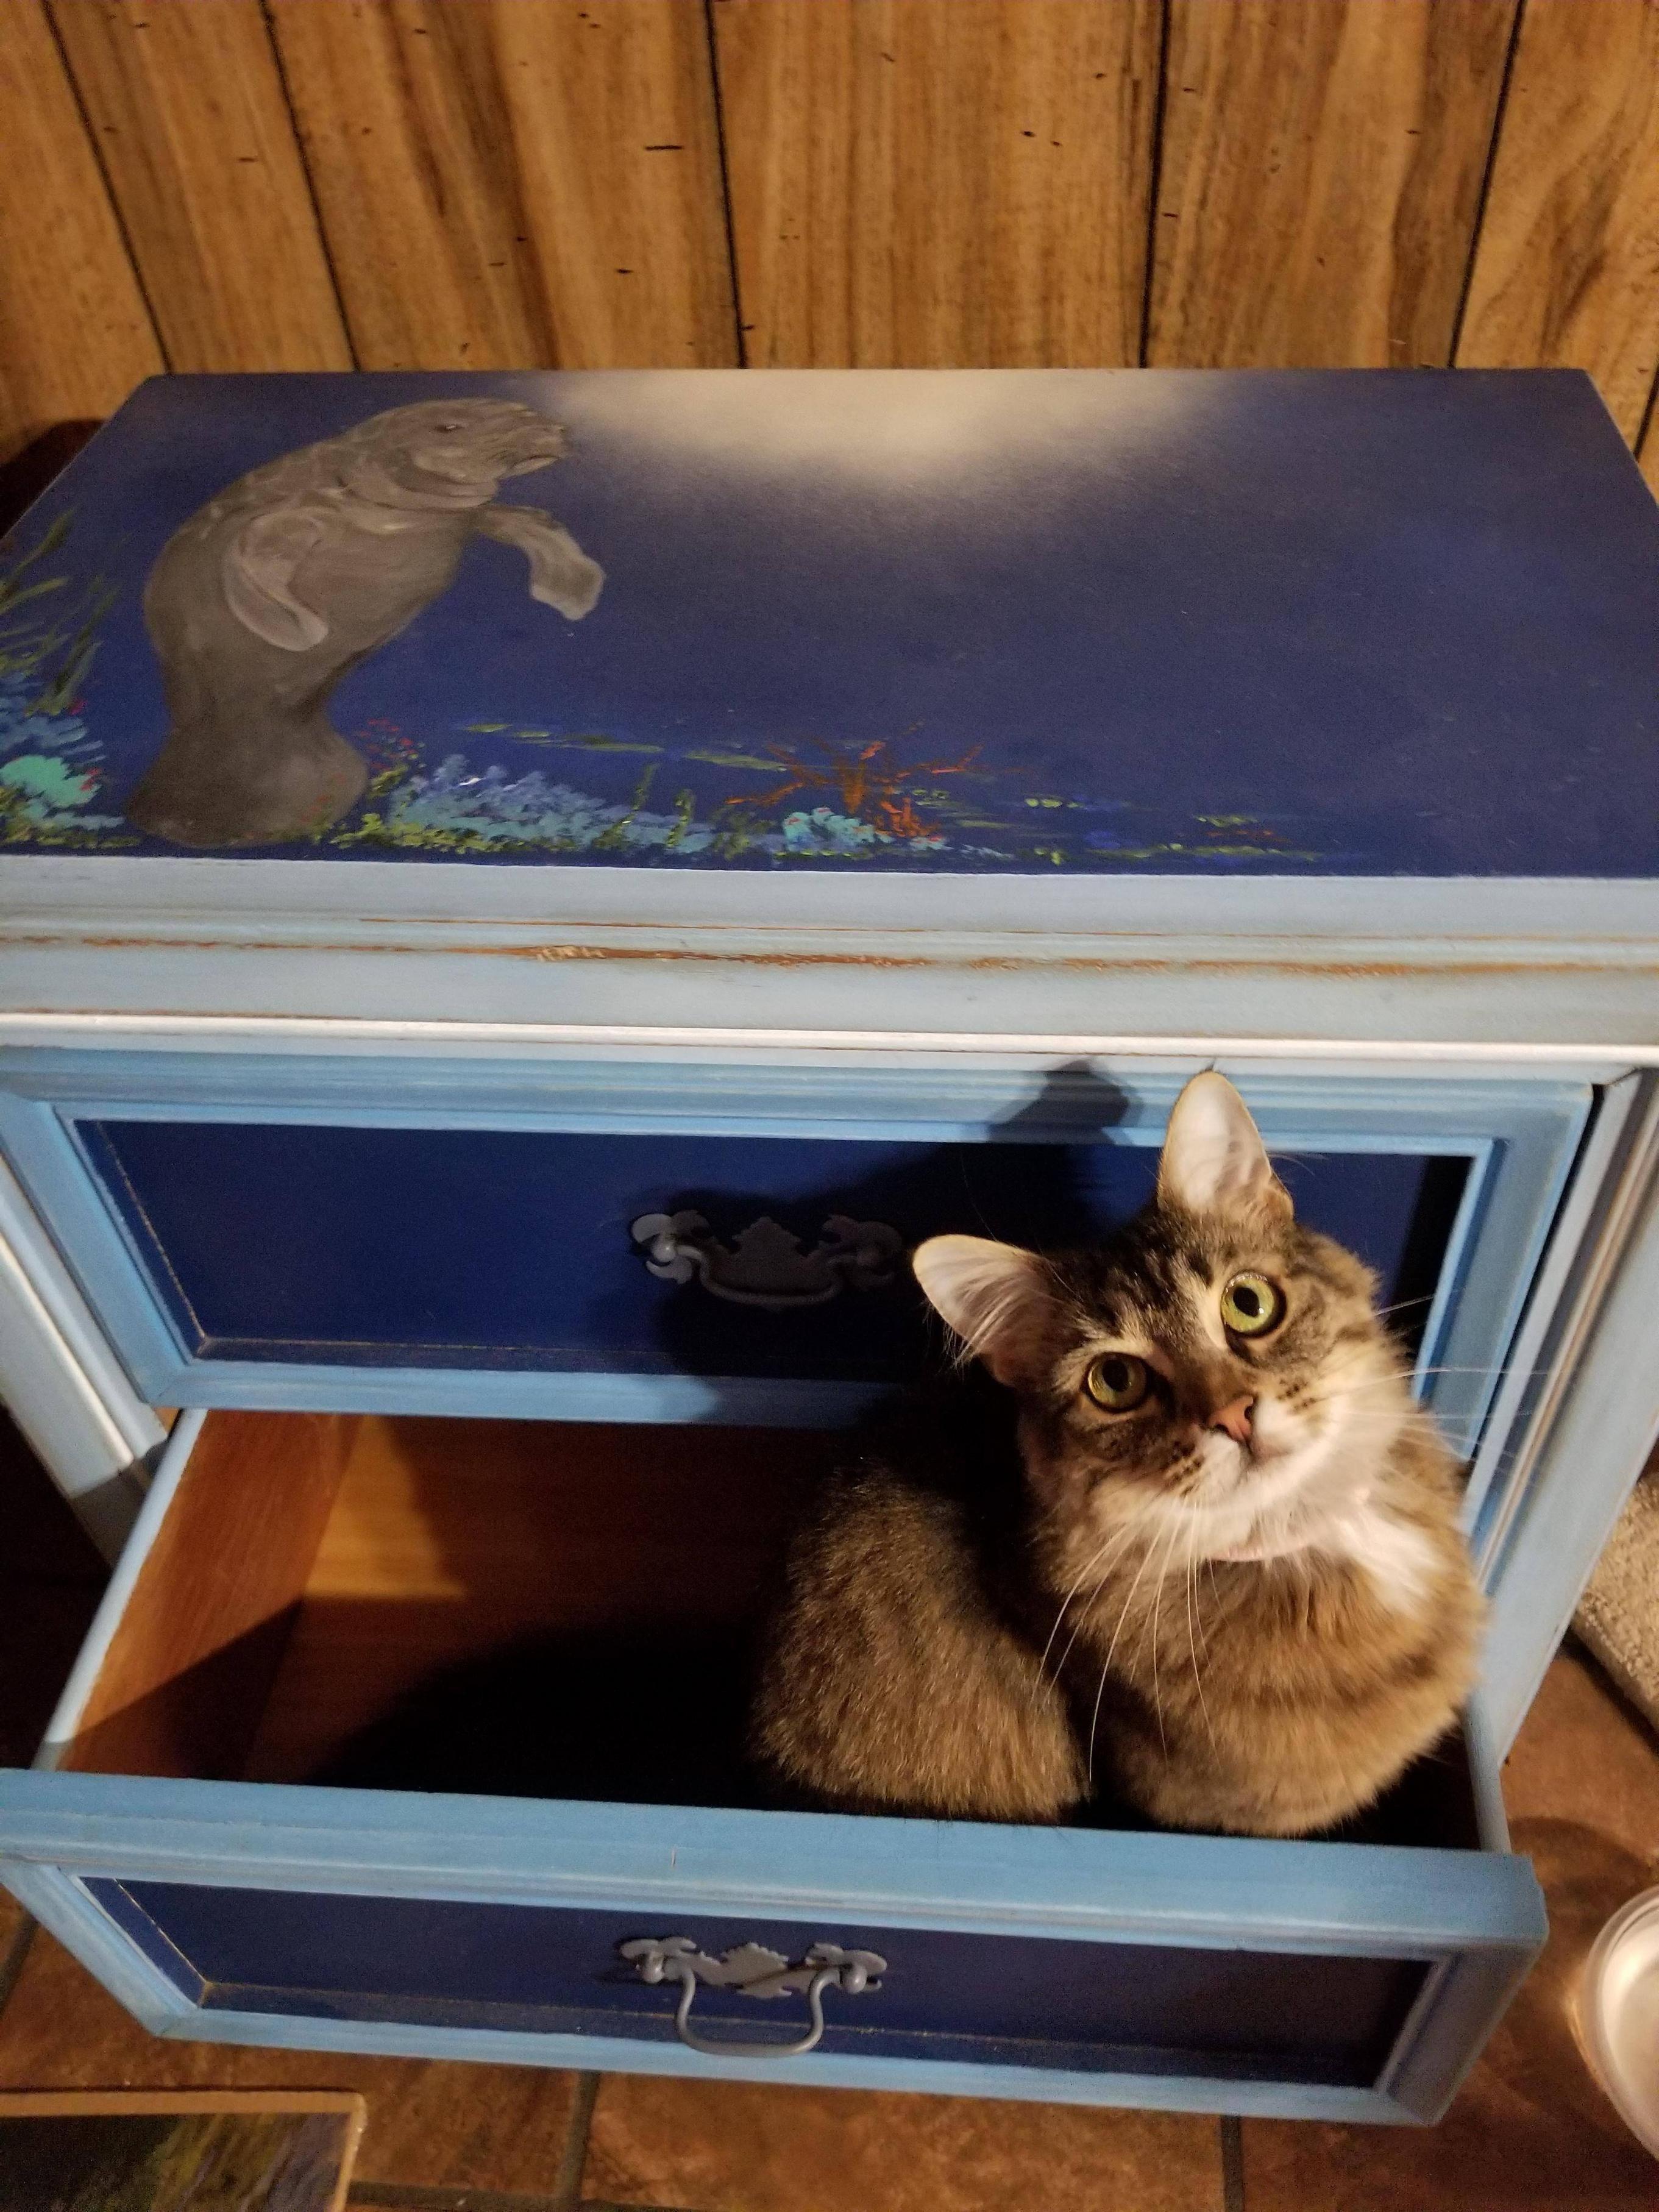 Whopper thinks we got her a new bed! #aww #cute #cutecats #catsofpinterest #cuddle #fluffy #animals #pets #bestfriend #boopthesnoot